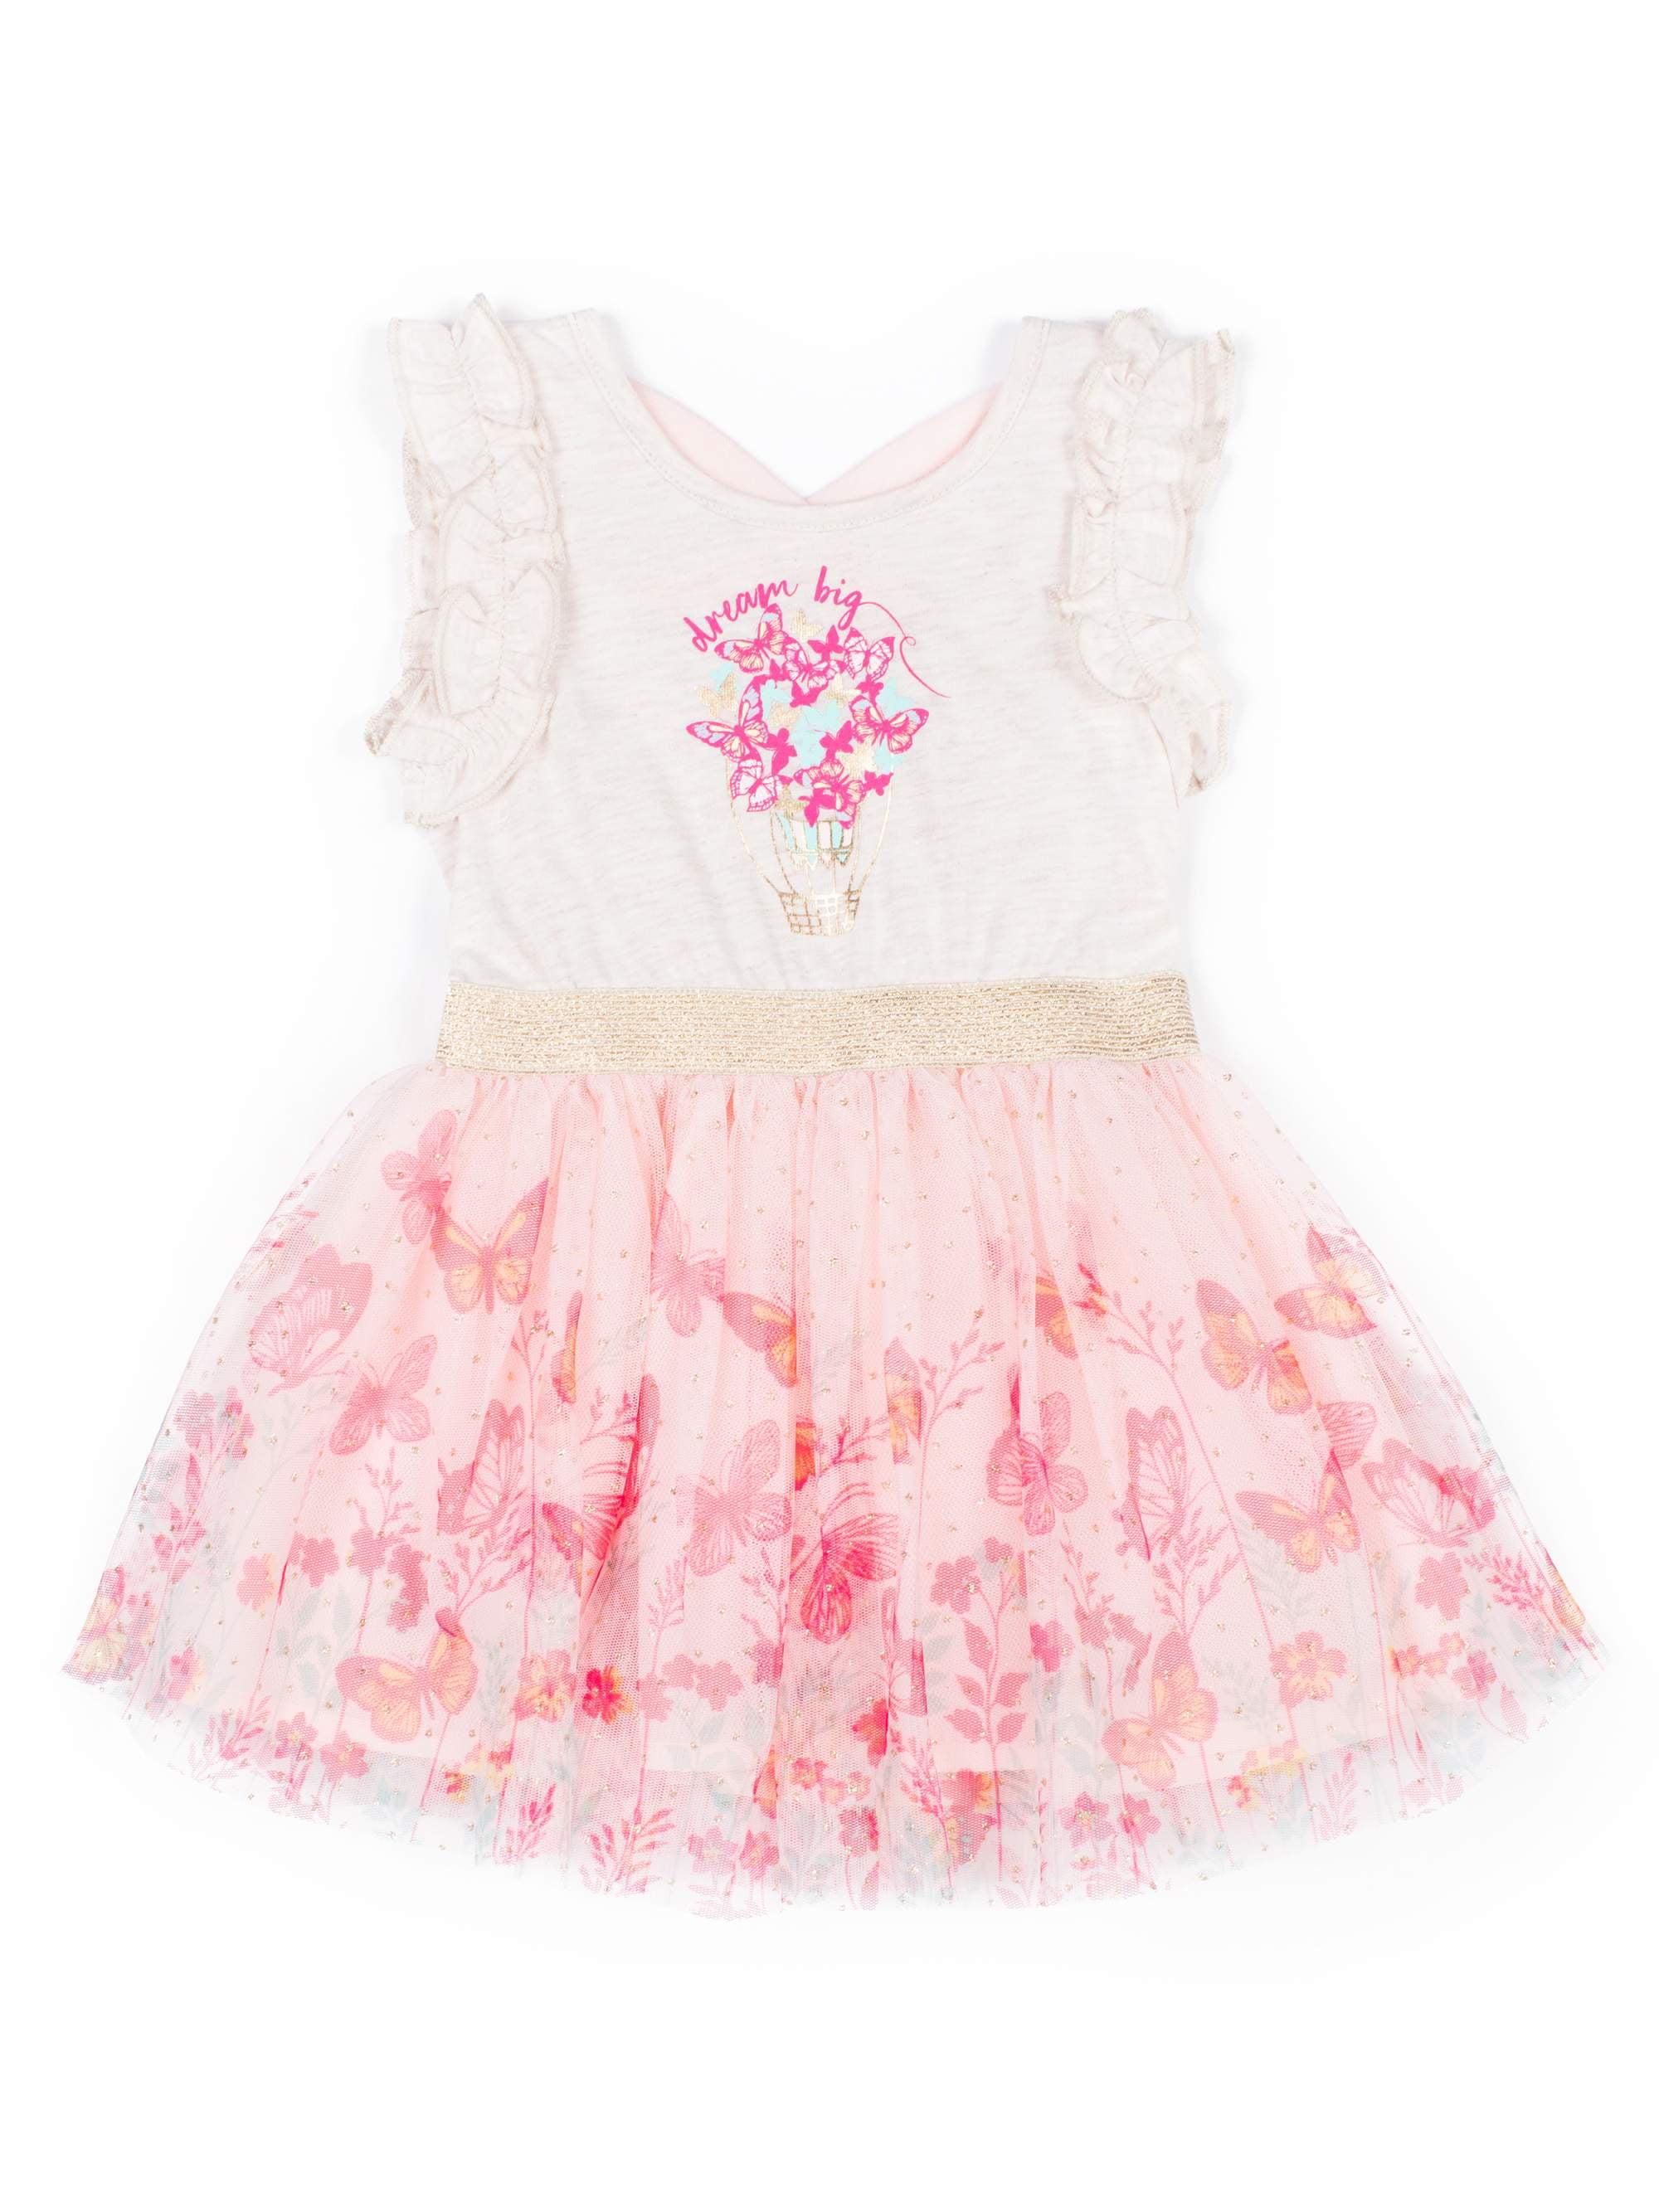 Dream Big Butterfly Tulle Dress (Little Girls)